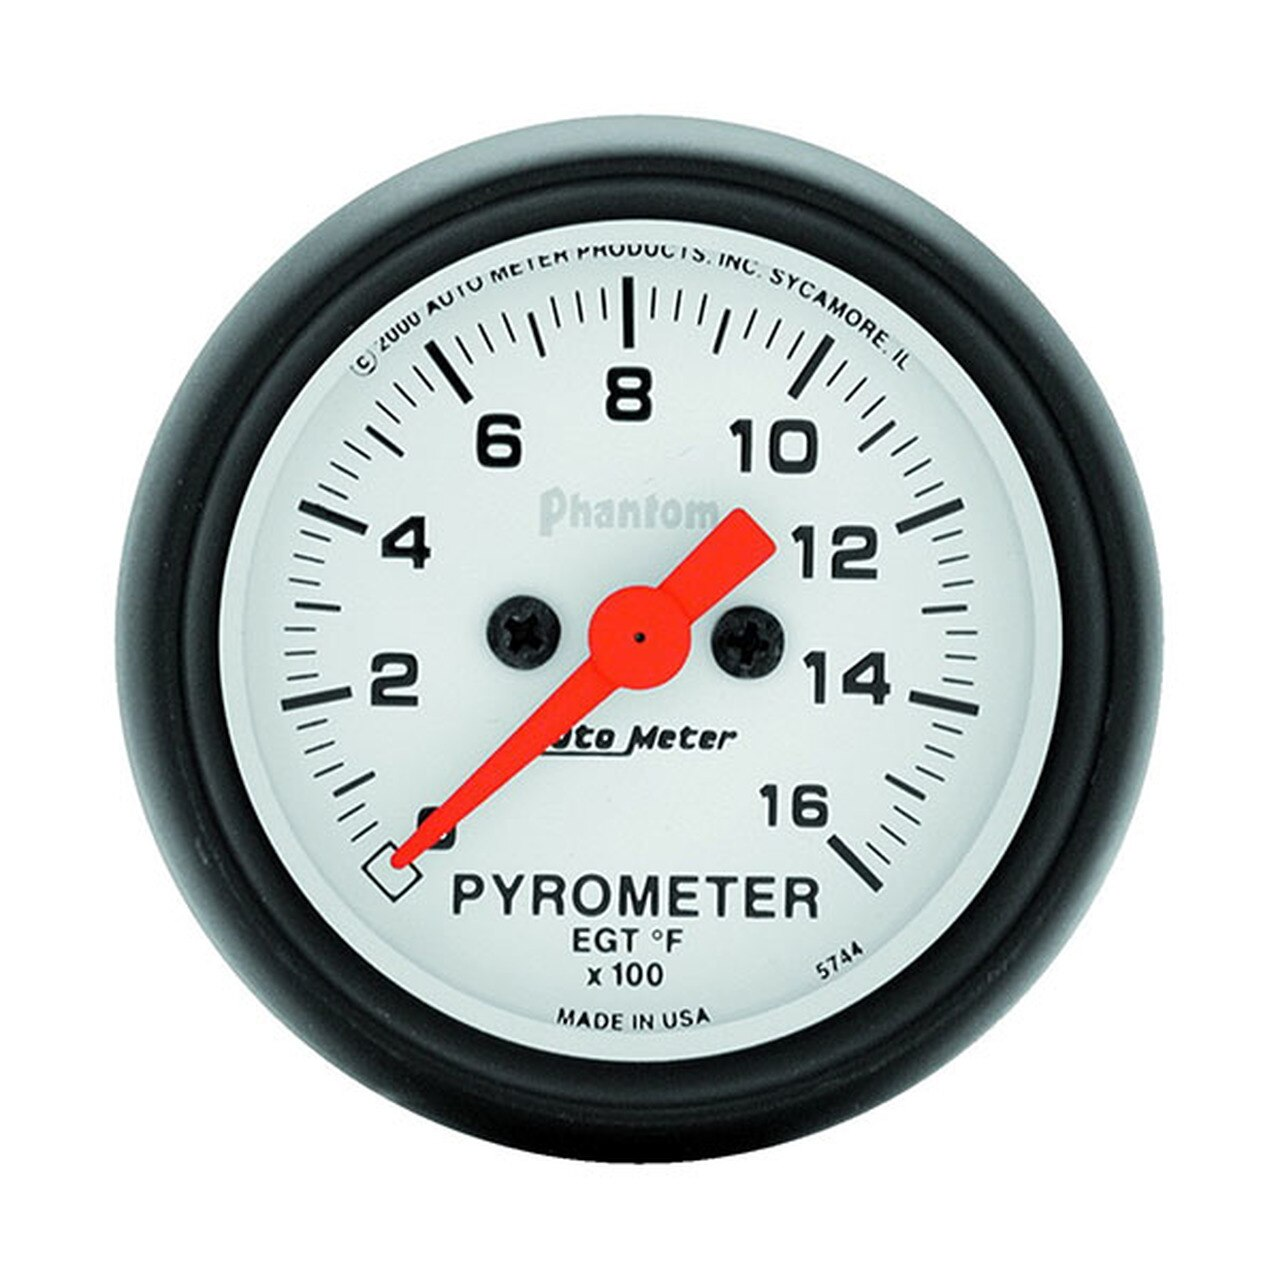 Wondrous Auto Meter 5766 Egt Pyrometer Gauge Kit 2 1 16 Inch 600 1600 F Wiring Cloud Onicaalyptbenolwigegmohammedshrineorg